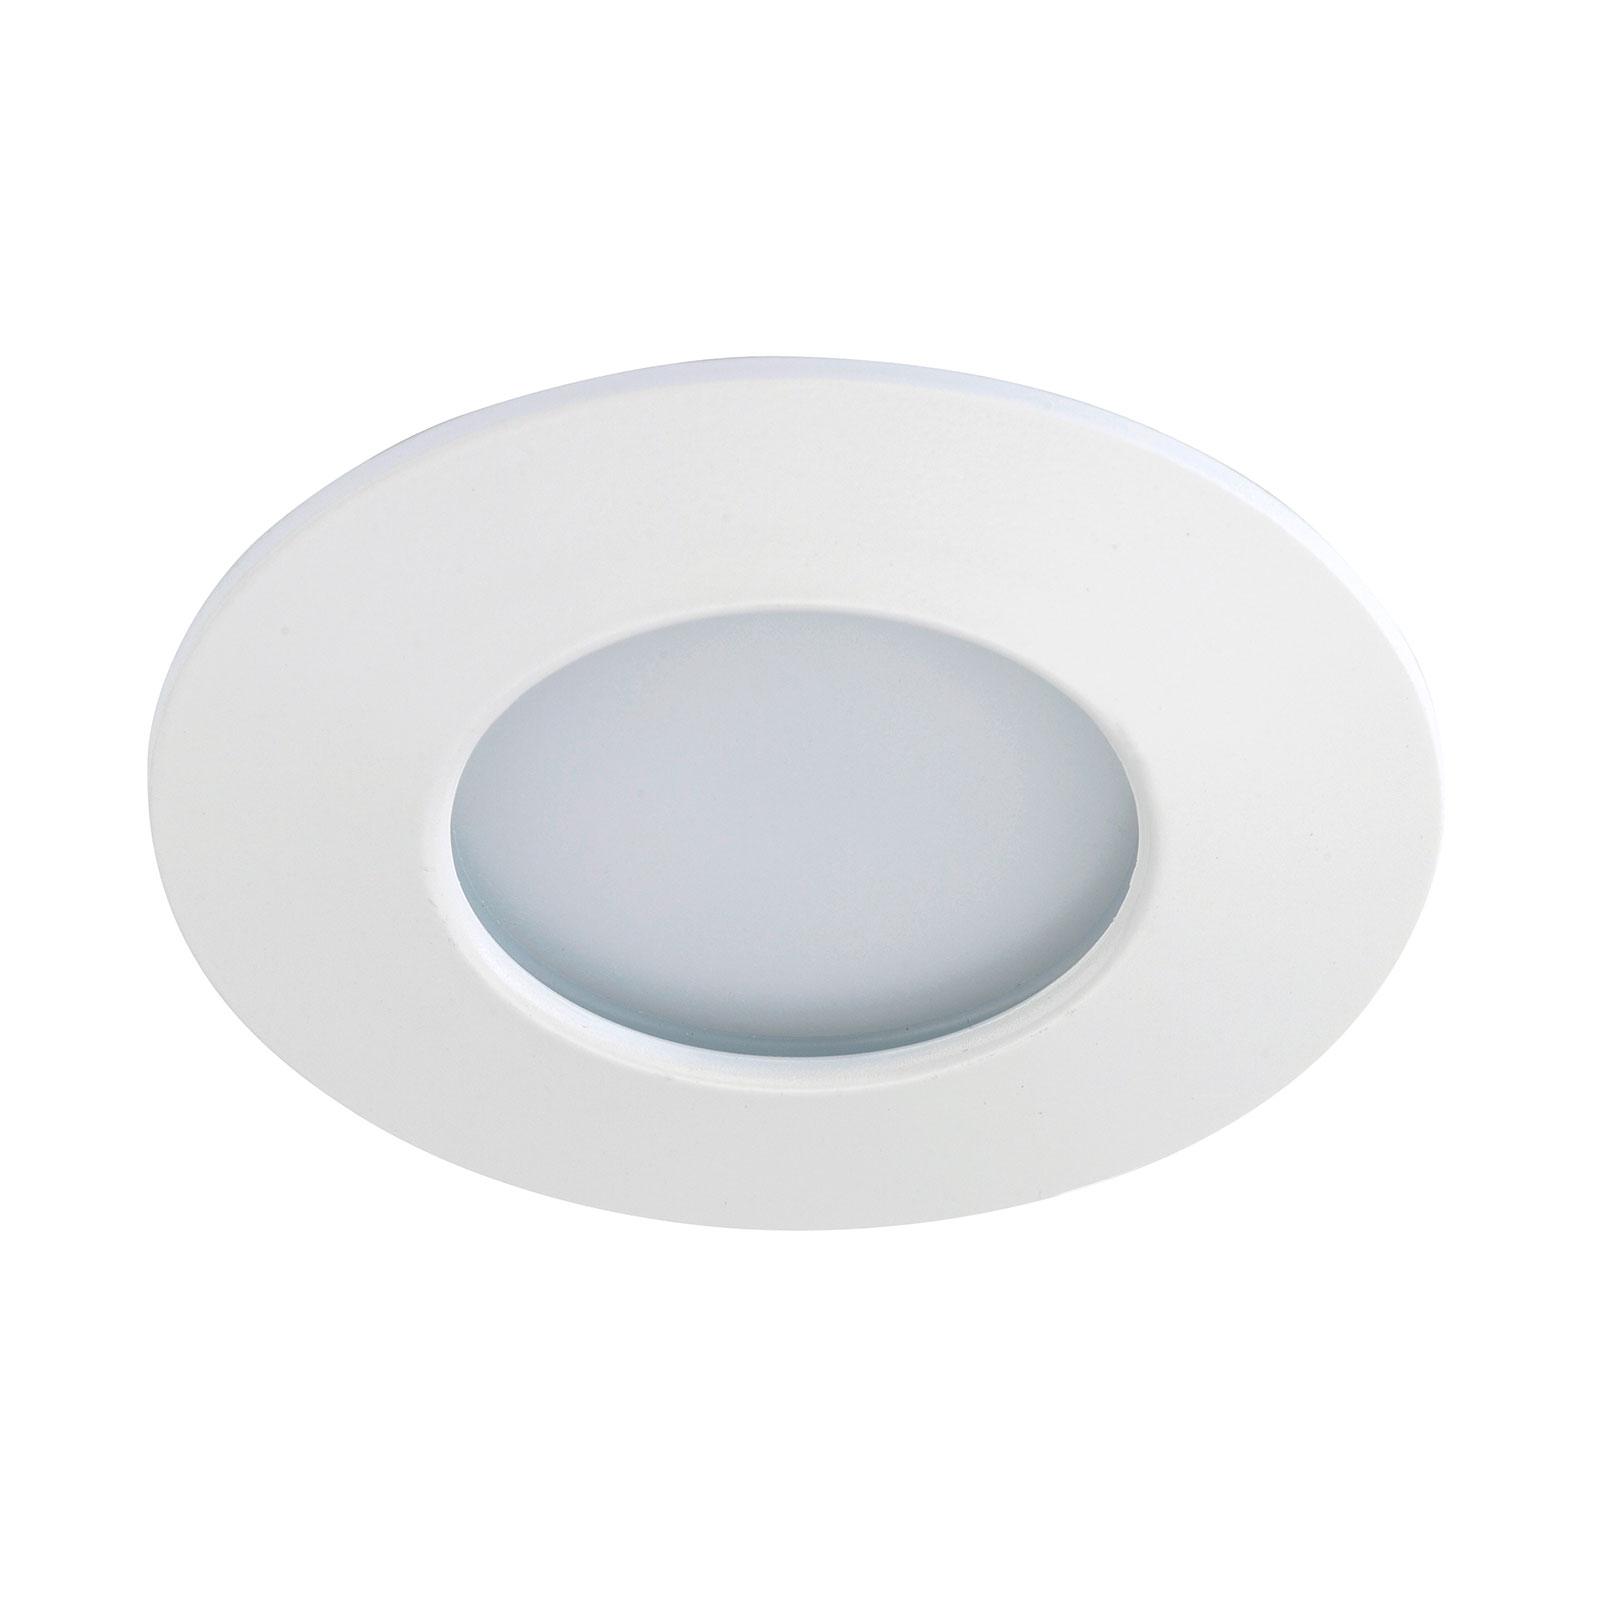 Lámpara empotrada LED blanca Till para exteriores